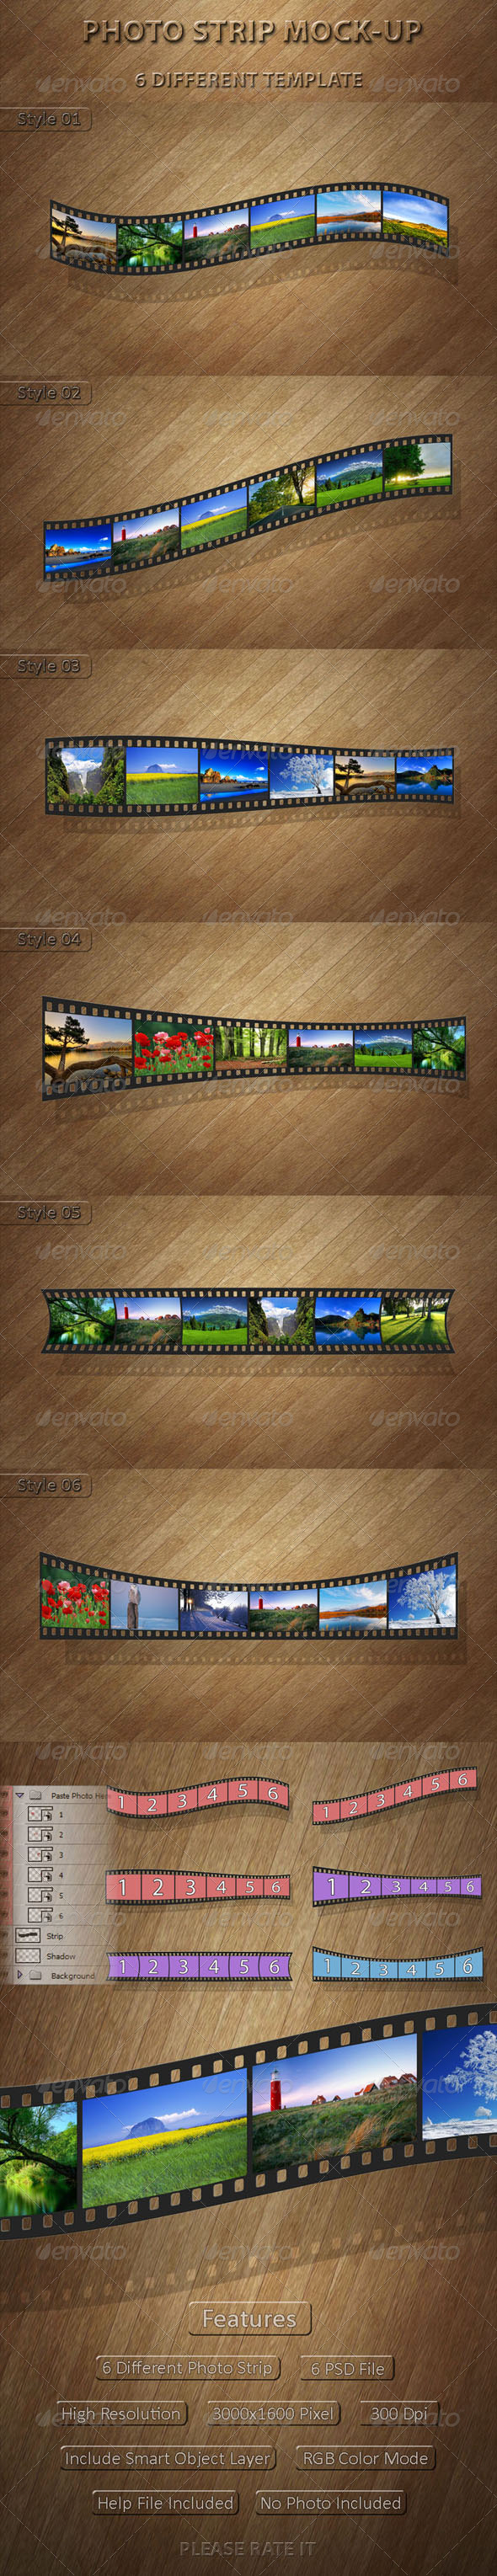 GraphicRiver Photo Strip Mock-Up 4983328